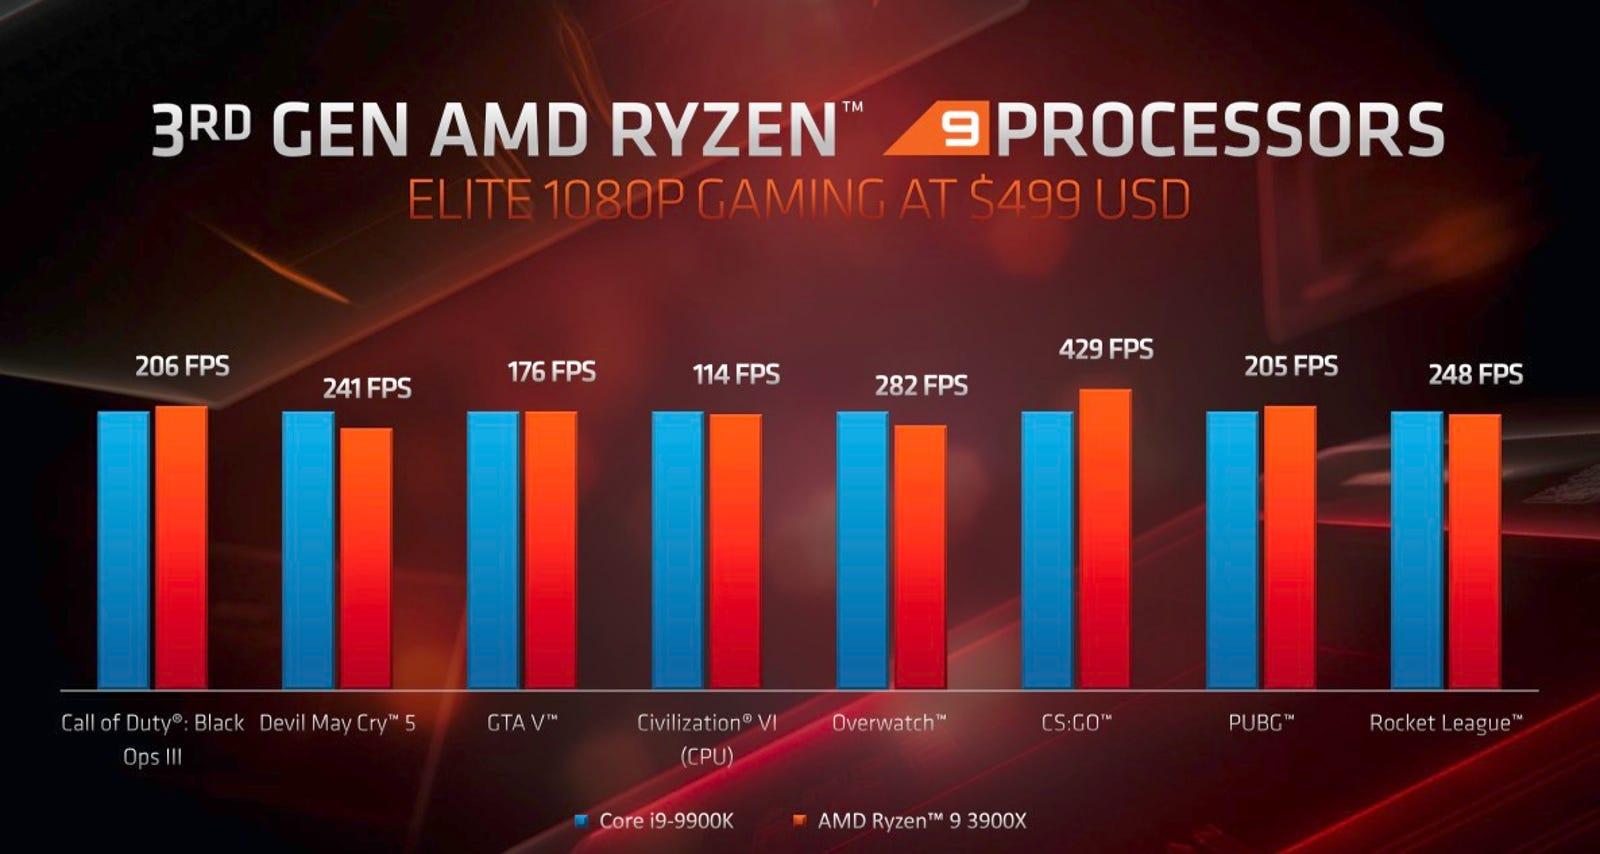 The Ryzen 9 3900X vs. the i9-9900K.